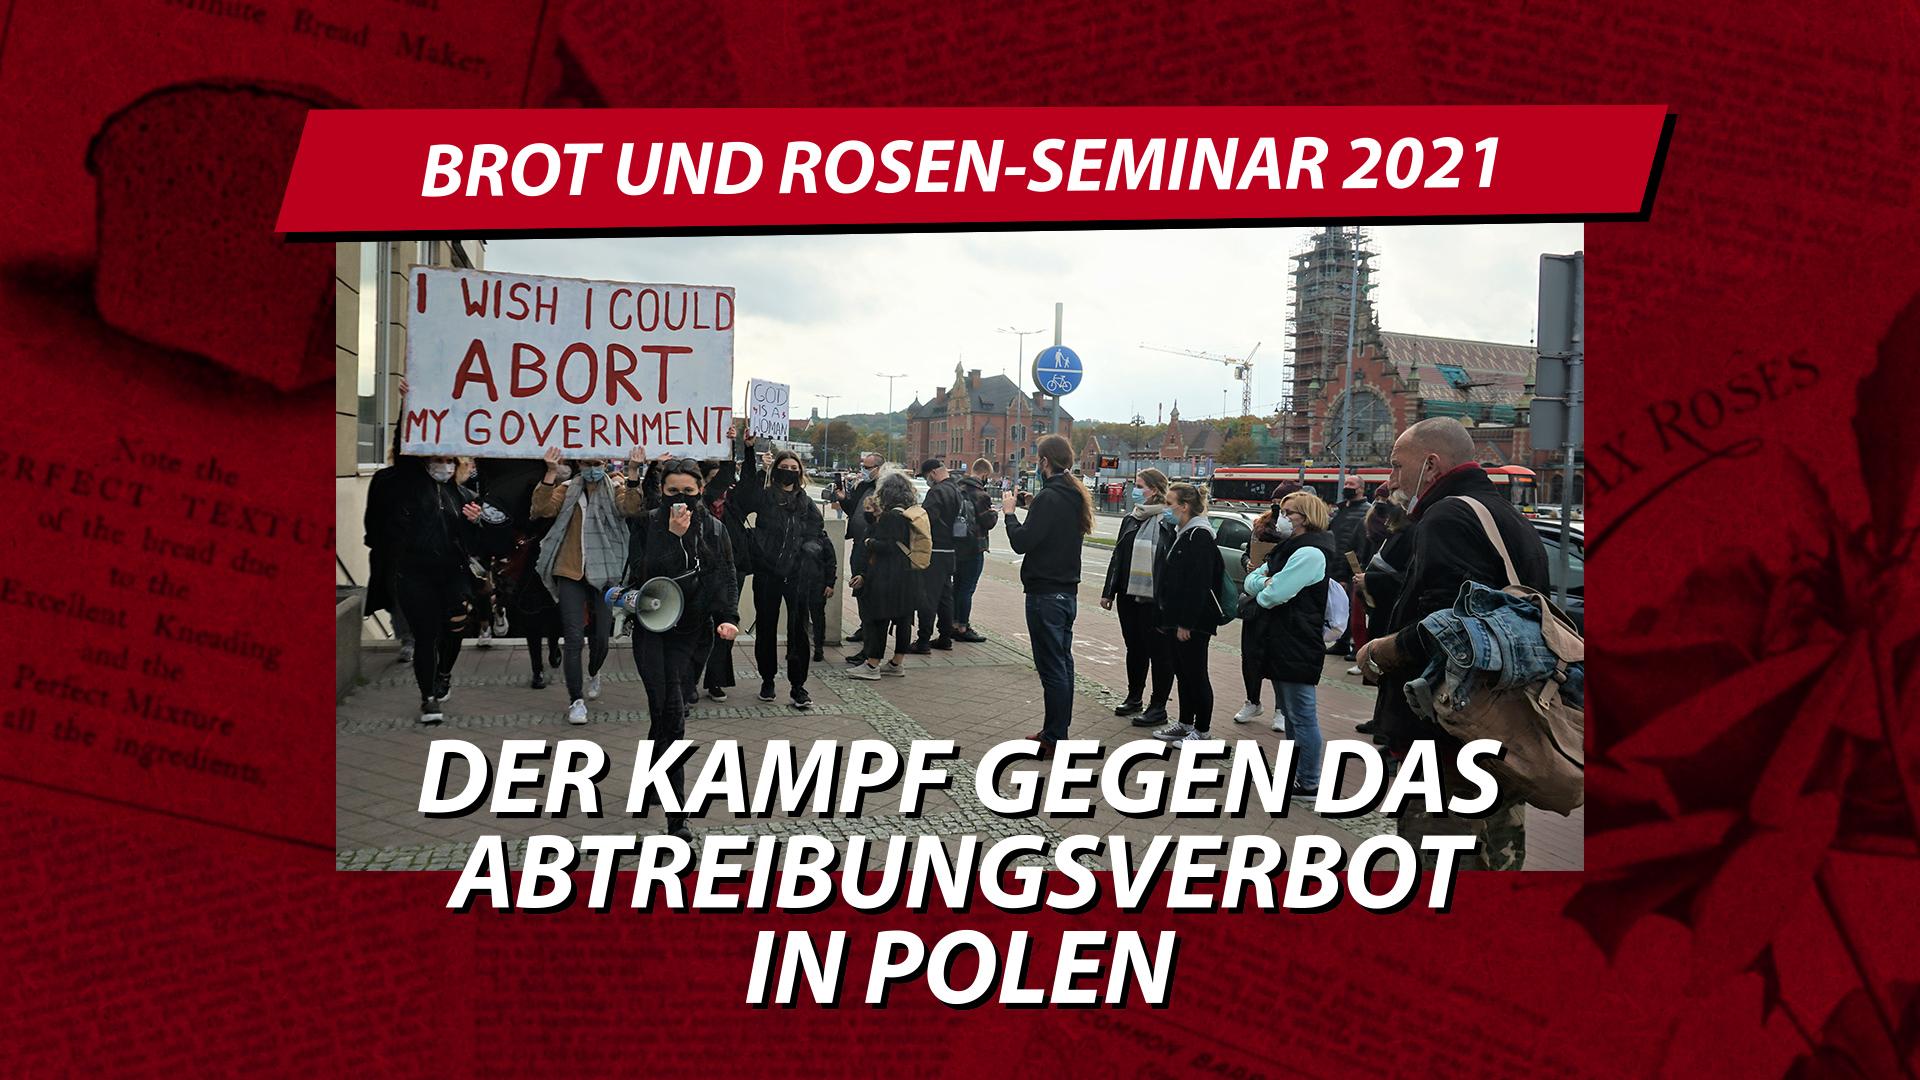 [VIDEO] [Englisch] Polen: Der Kampf gegen das Abtreibungsverbot